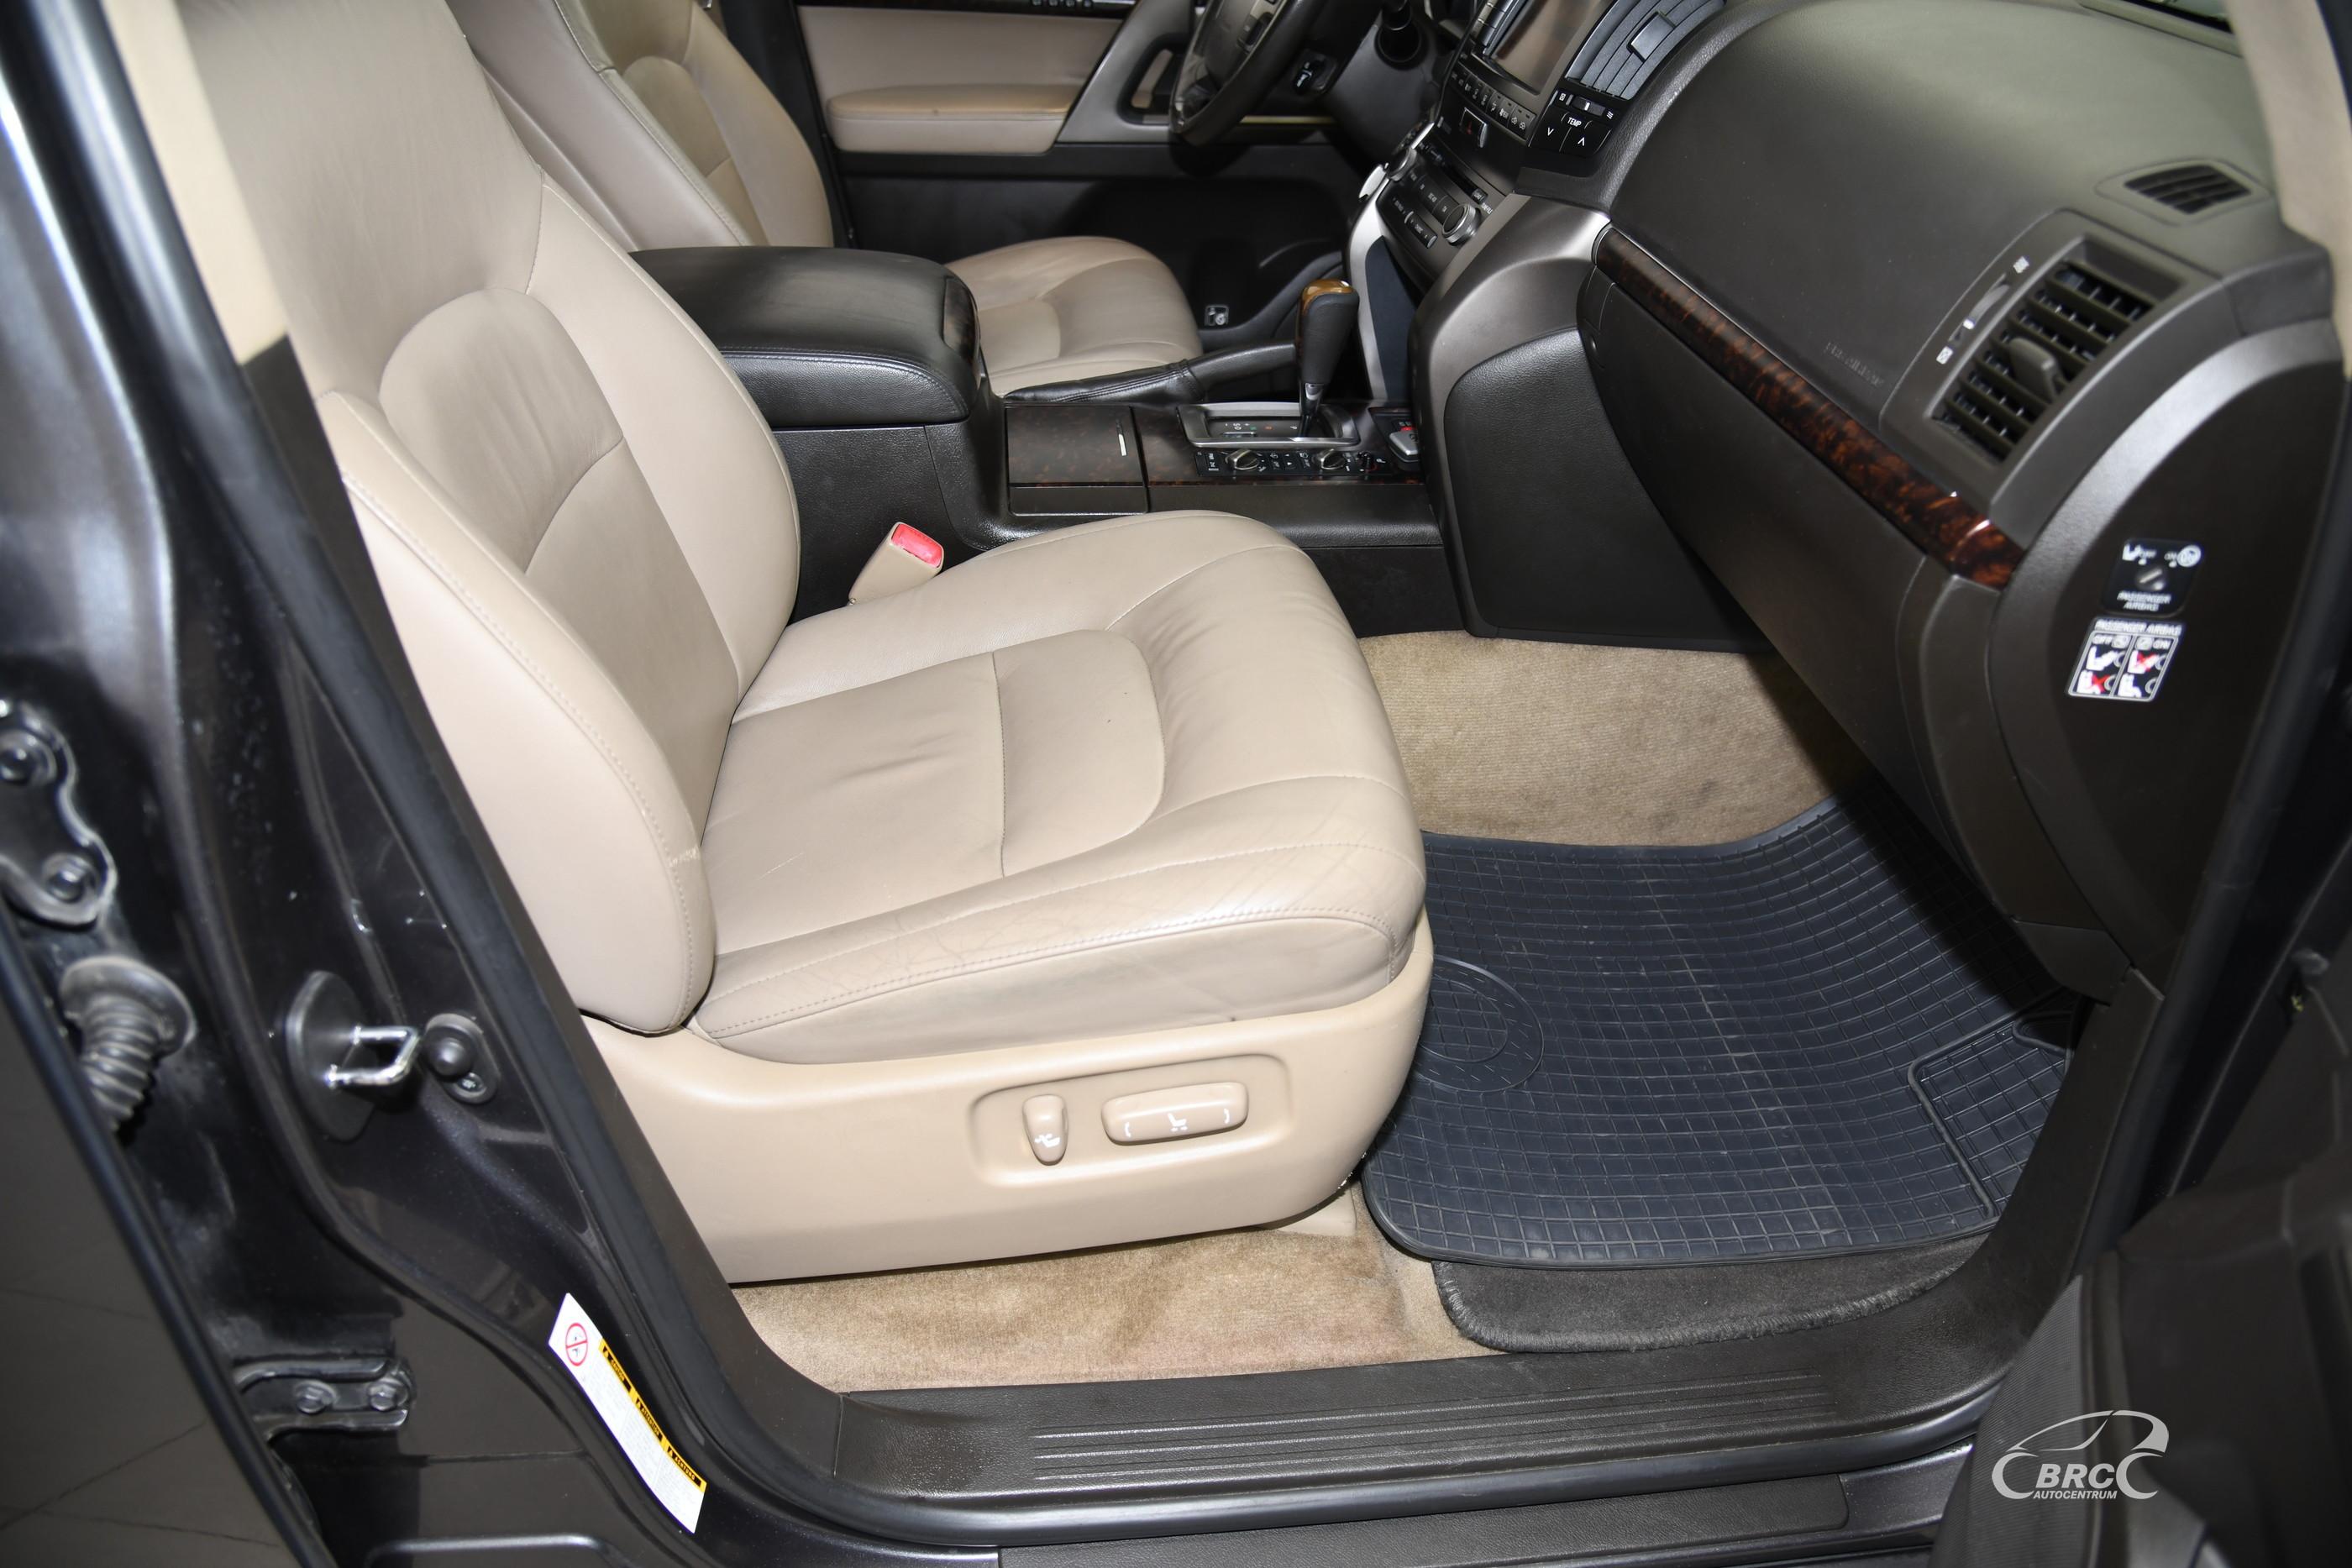 Toyota Land Cruiser 4.5 V8 D-4D 4WD L200 Automatas